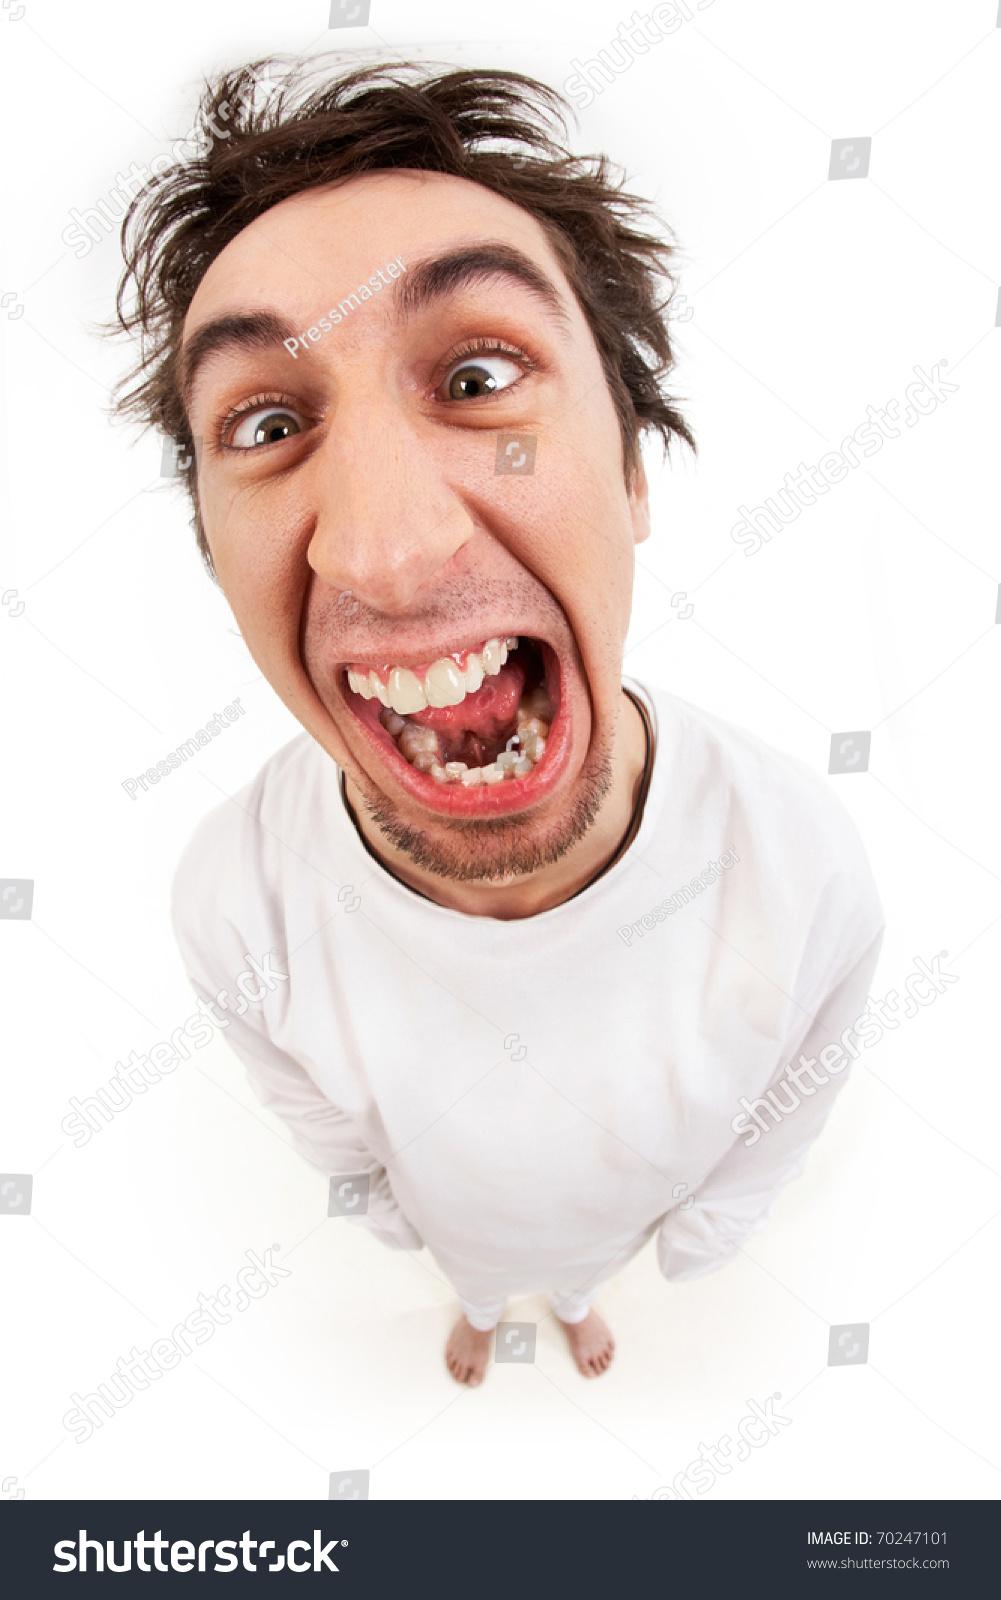 Fish Eye Shot Screaming Insane Man Stock Photo 70247101 - Shutterstock